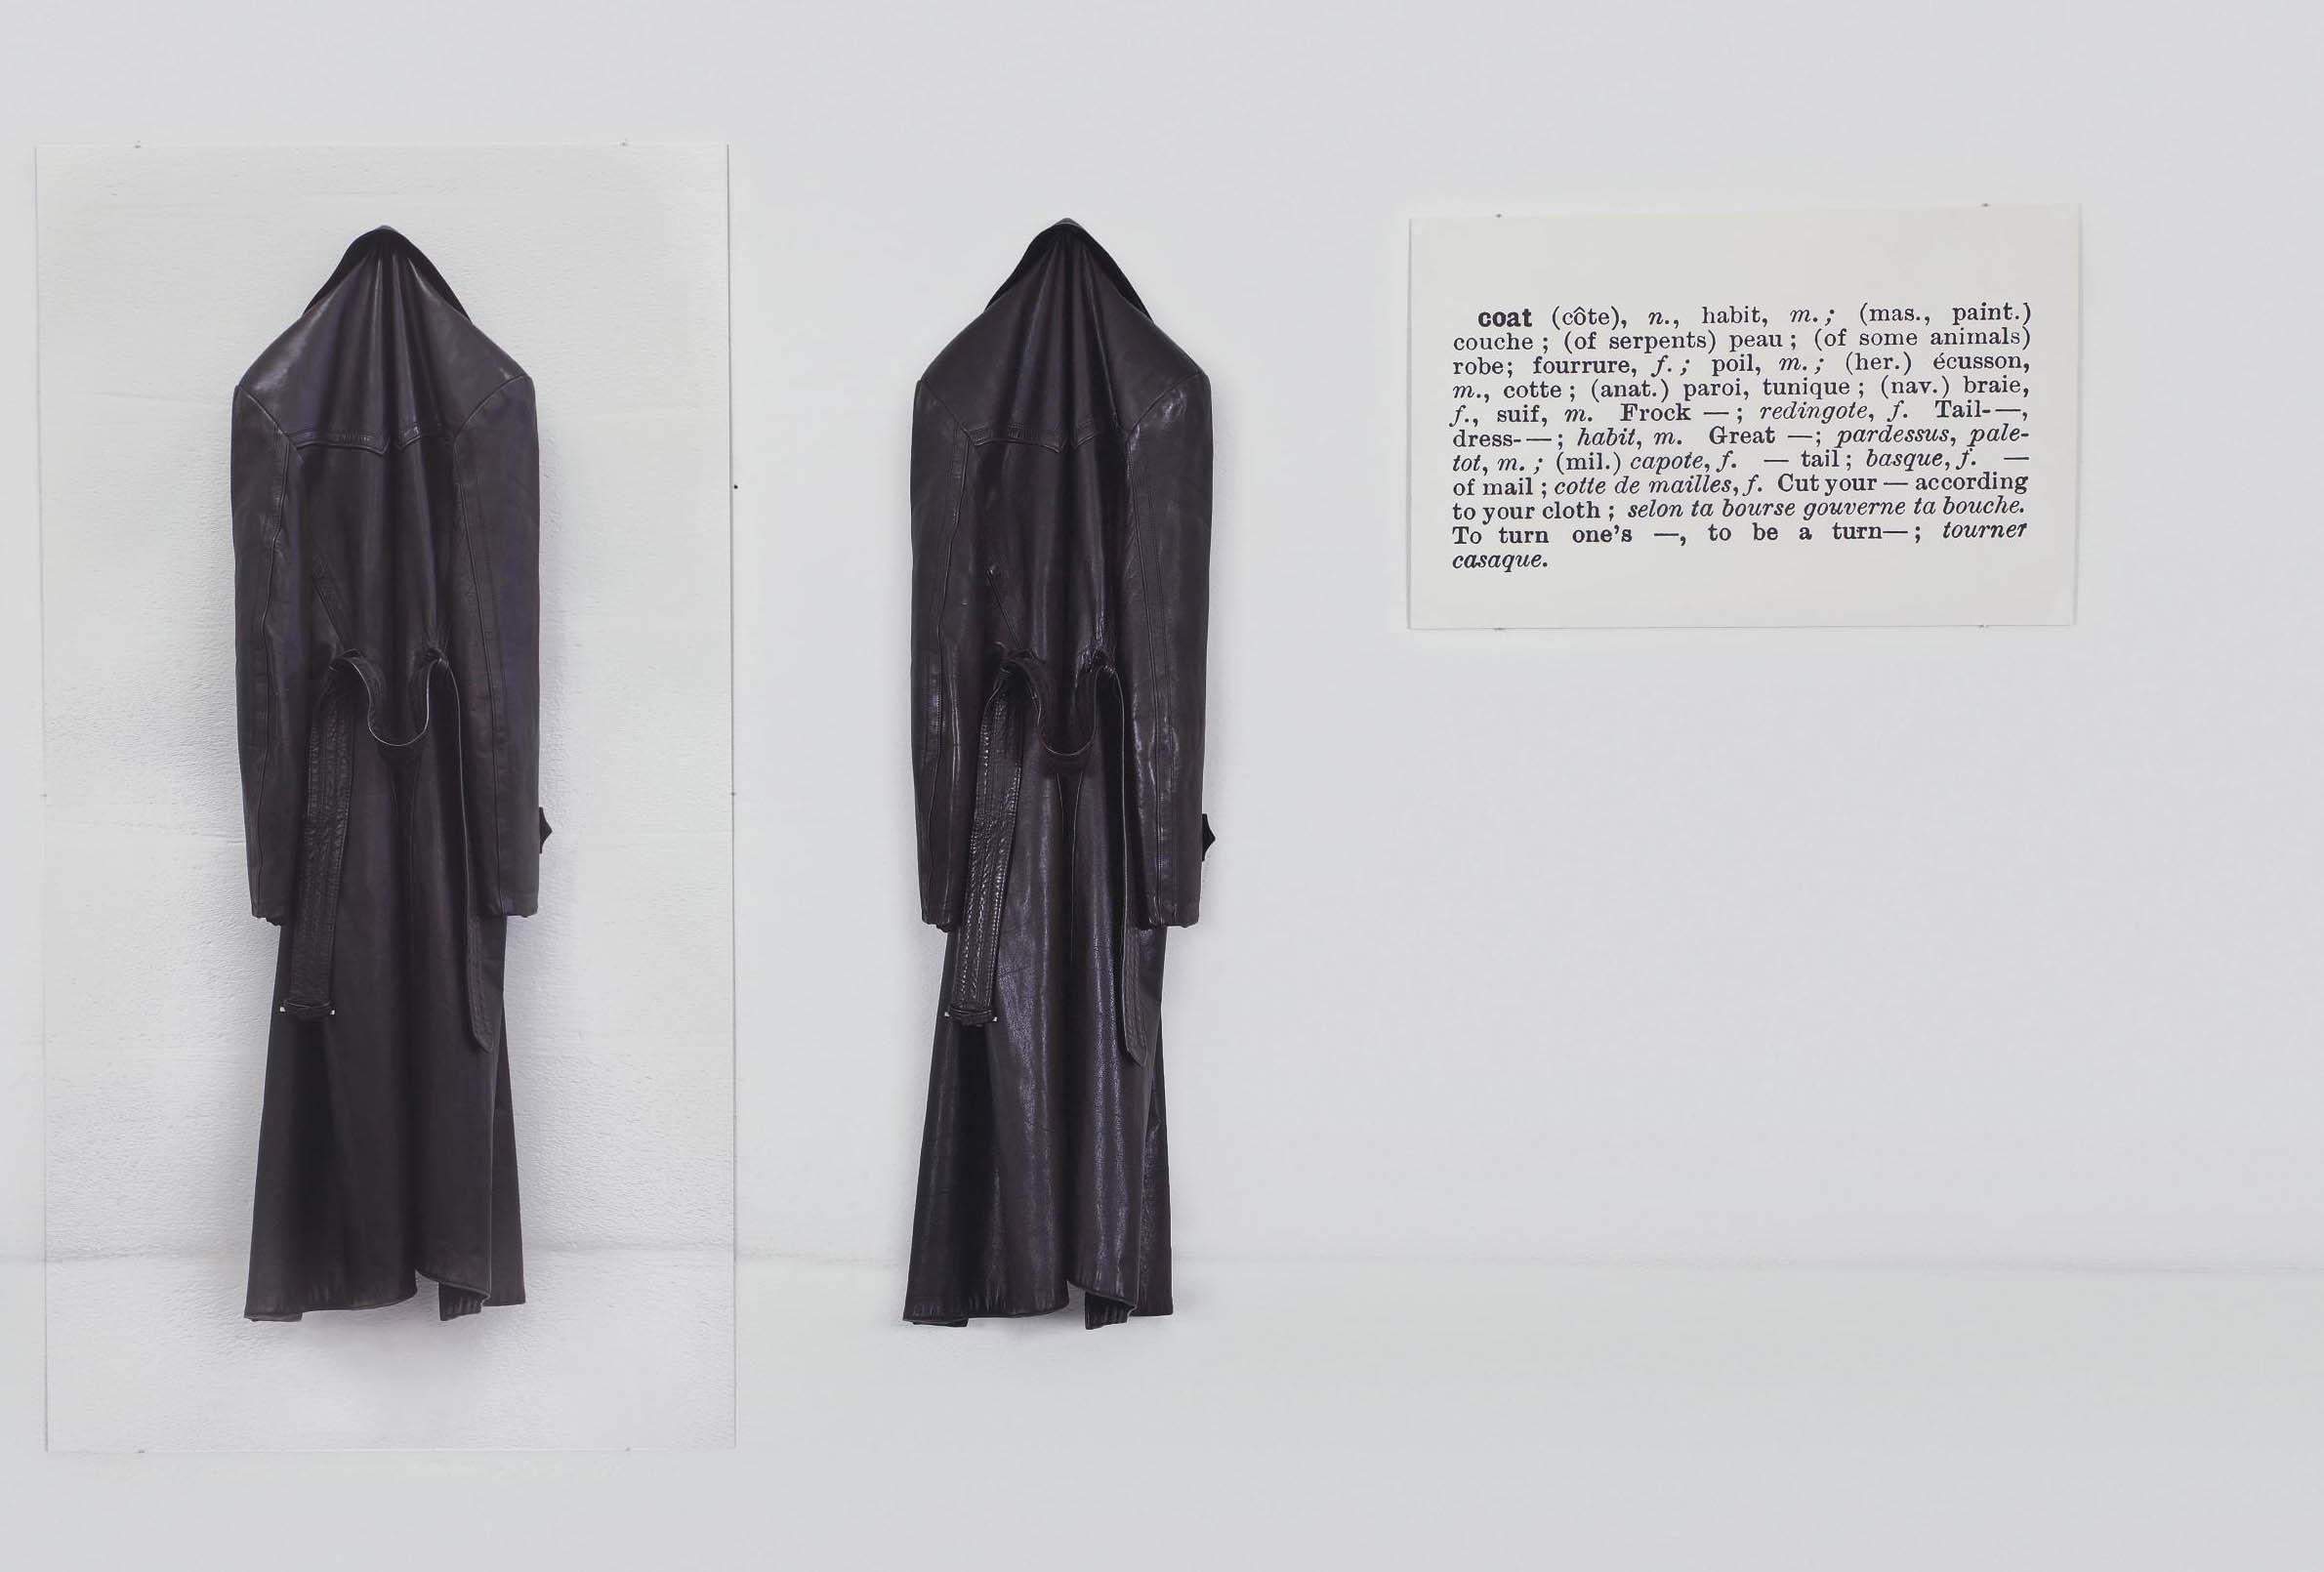 One and Three Coats